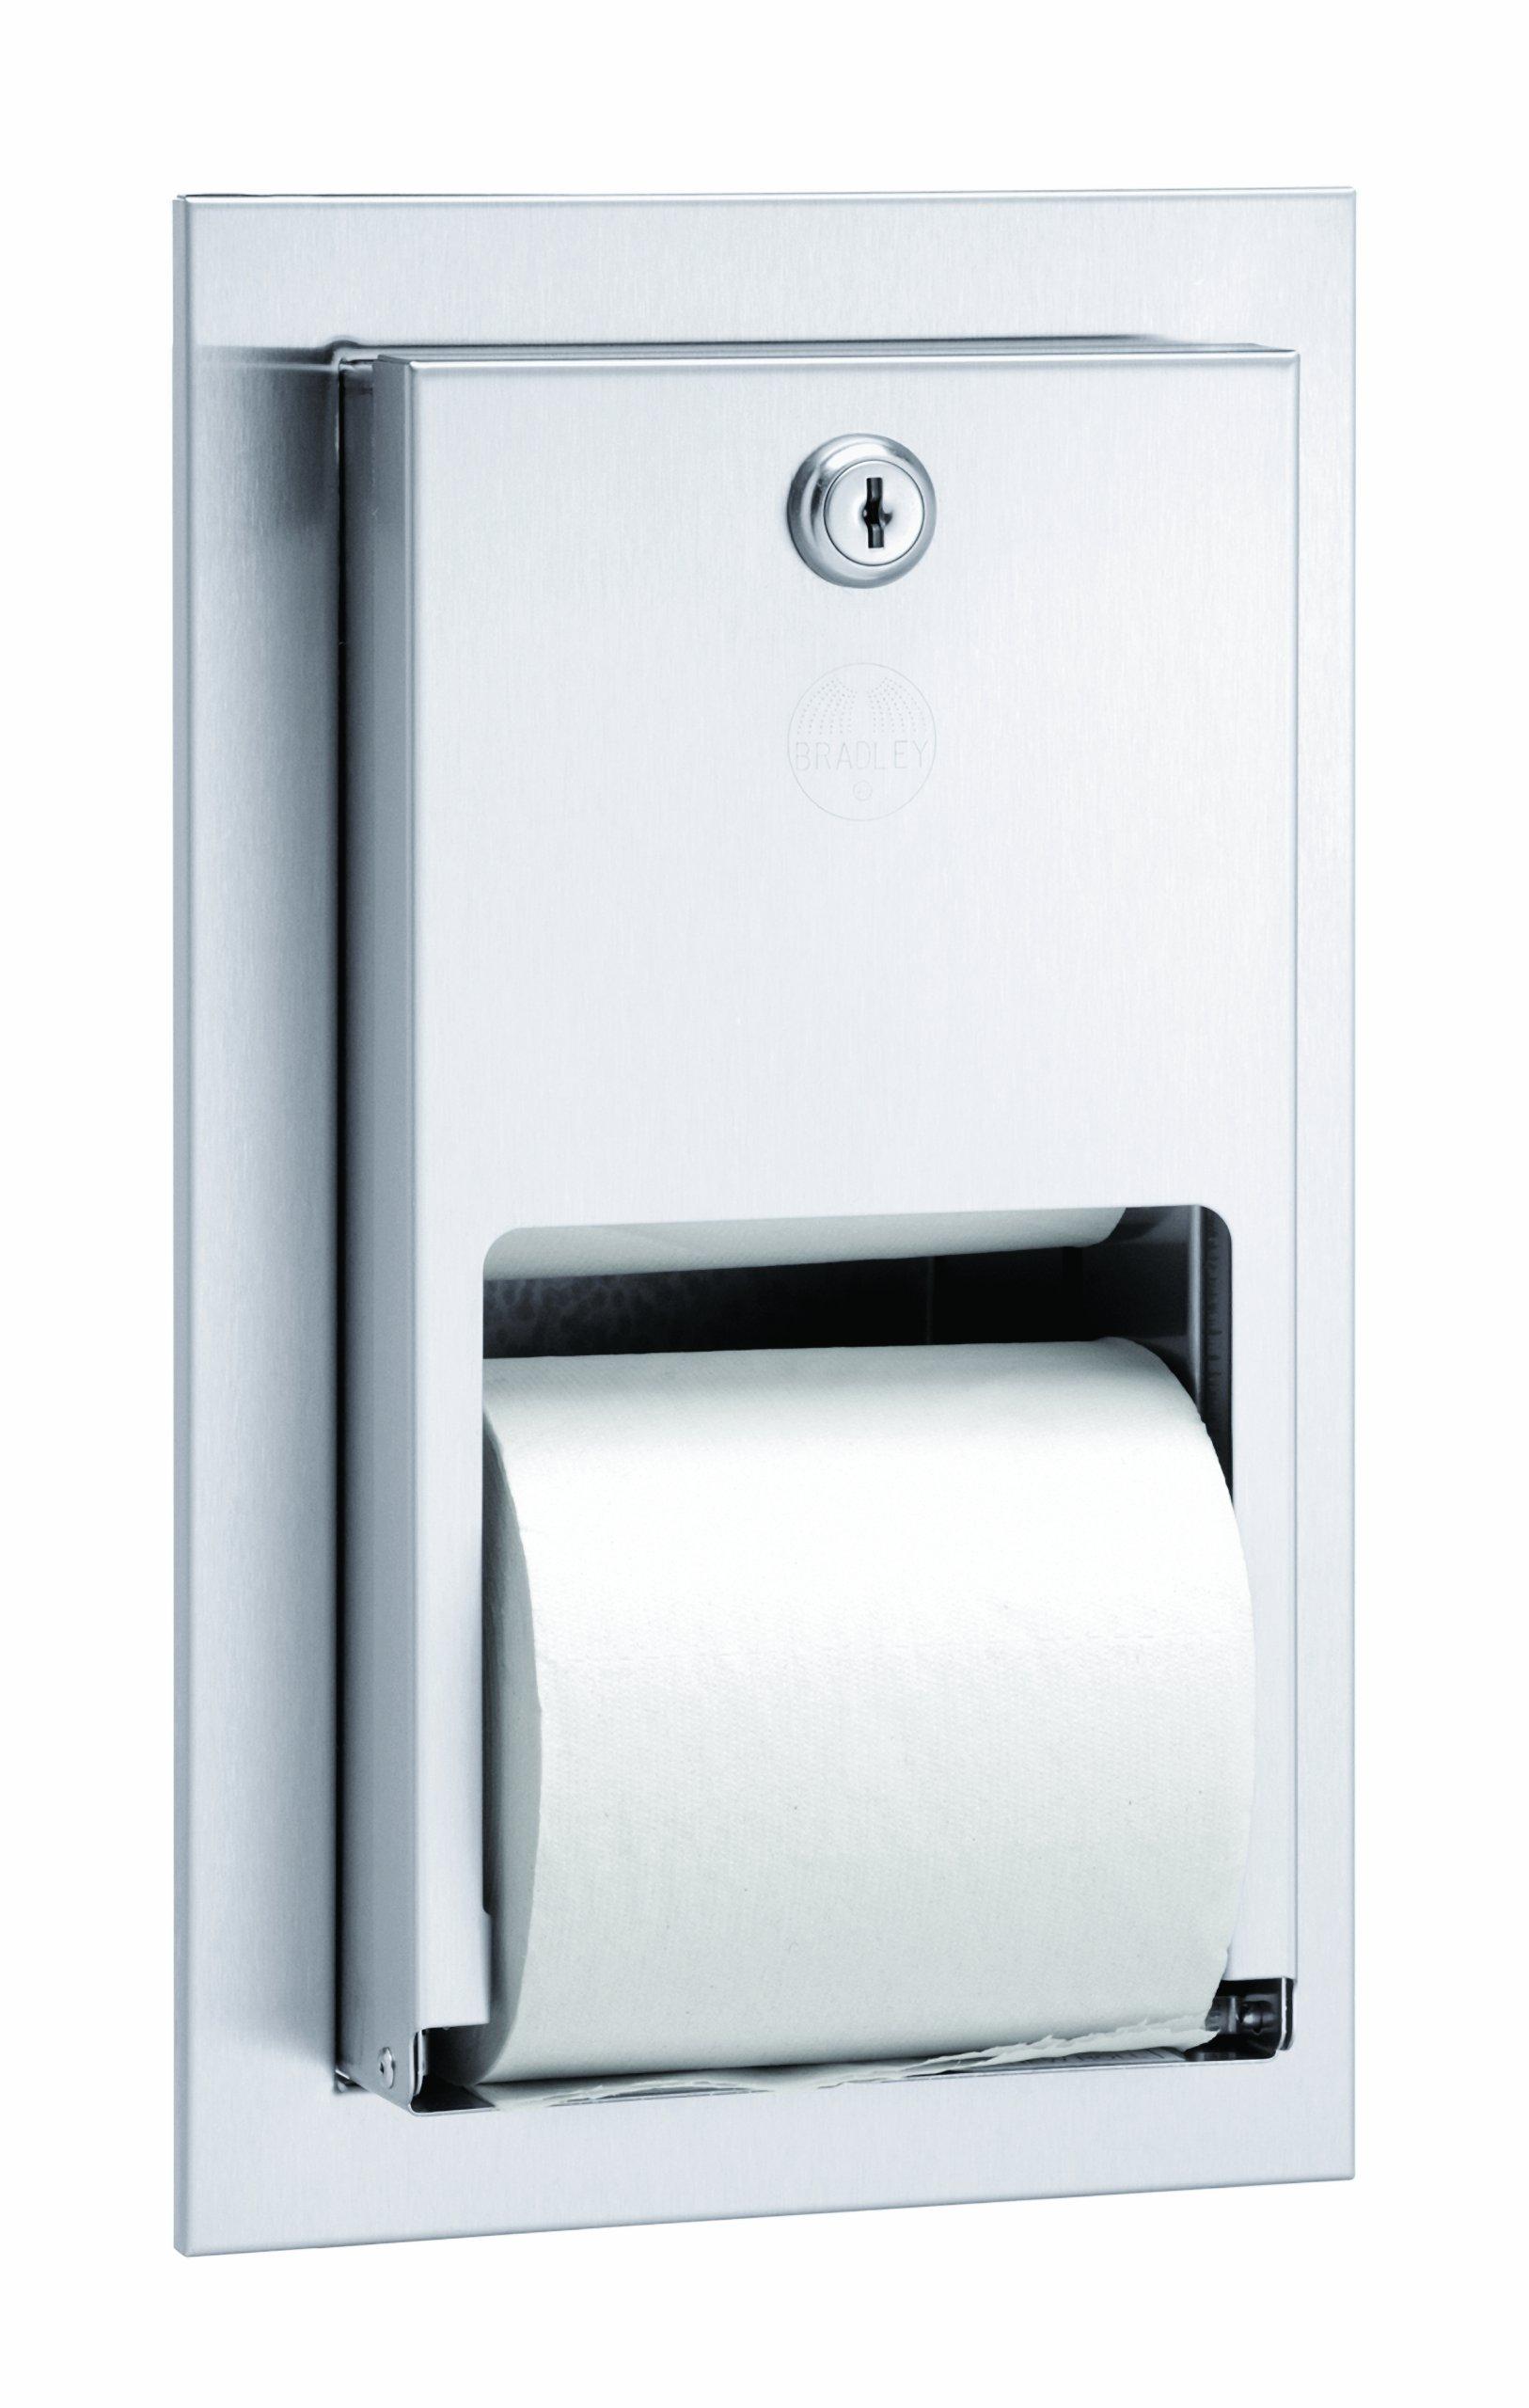 Bradley 5412-000000 22 Gauge Stainless Steel Recessed Mounted Stacking Rolls Toilet Tissue Dispenser, 5-5/8'' Width x 10-3/8'' Height x 5-5/16'' Depth